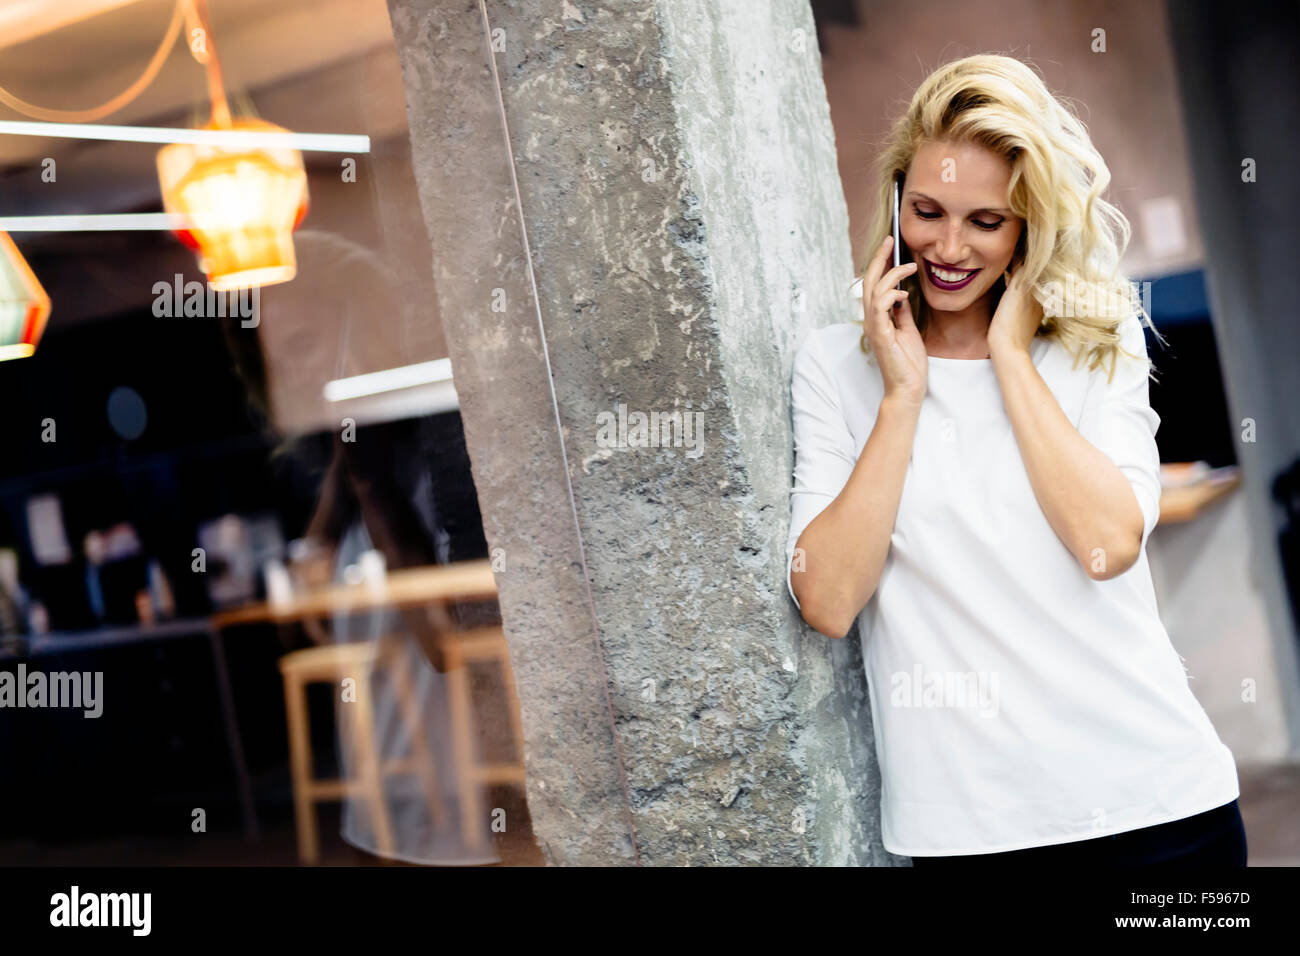 Beautiful woman talking on mobile phone - Stock Image